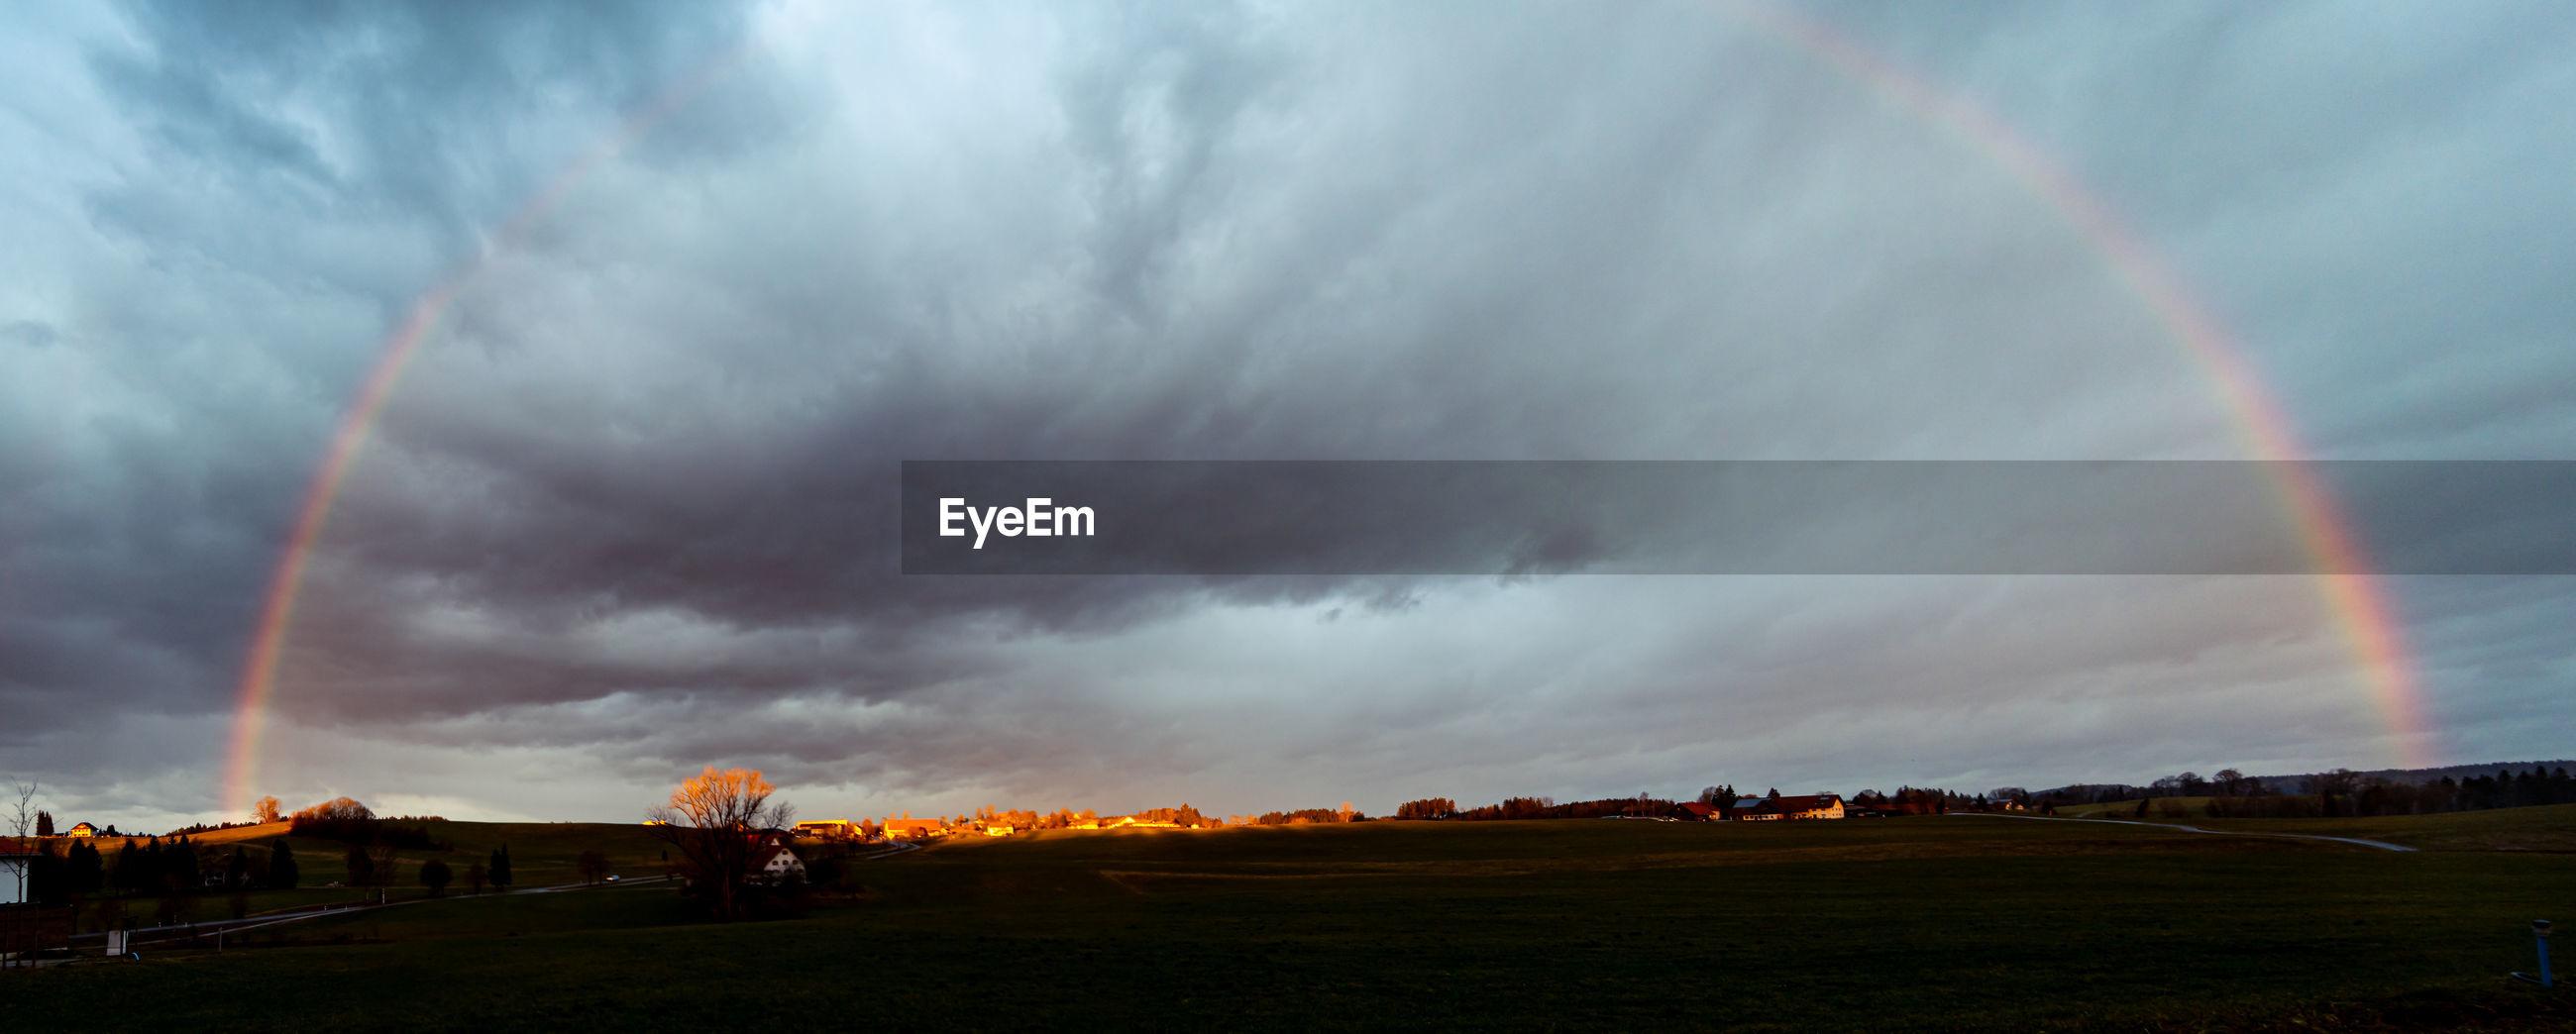 PANORAMIC VIEW OF RAINBOW OVER FIELD